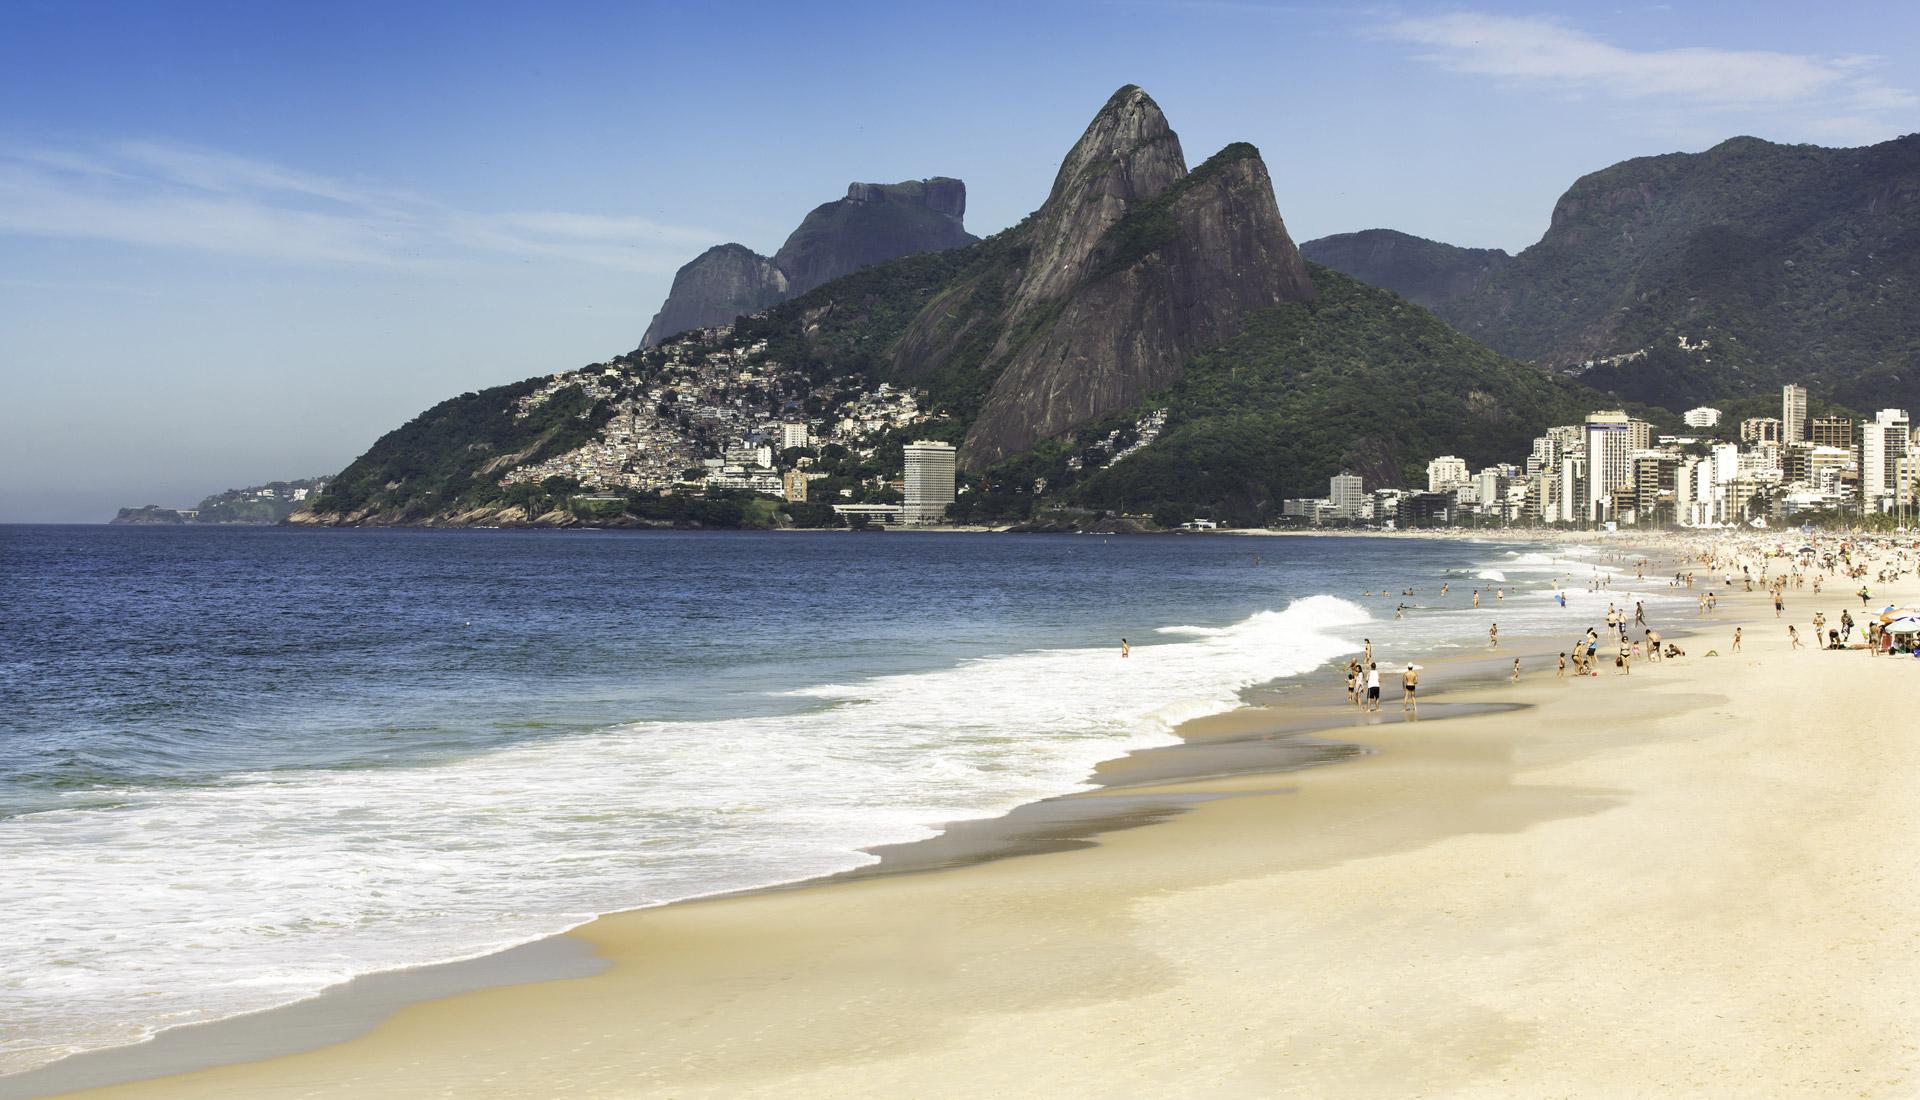 Brésil - Métissage en terres de démesure